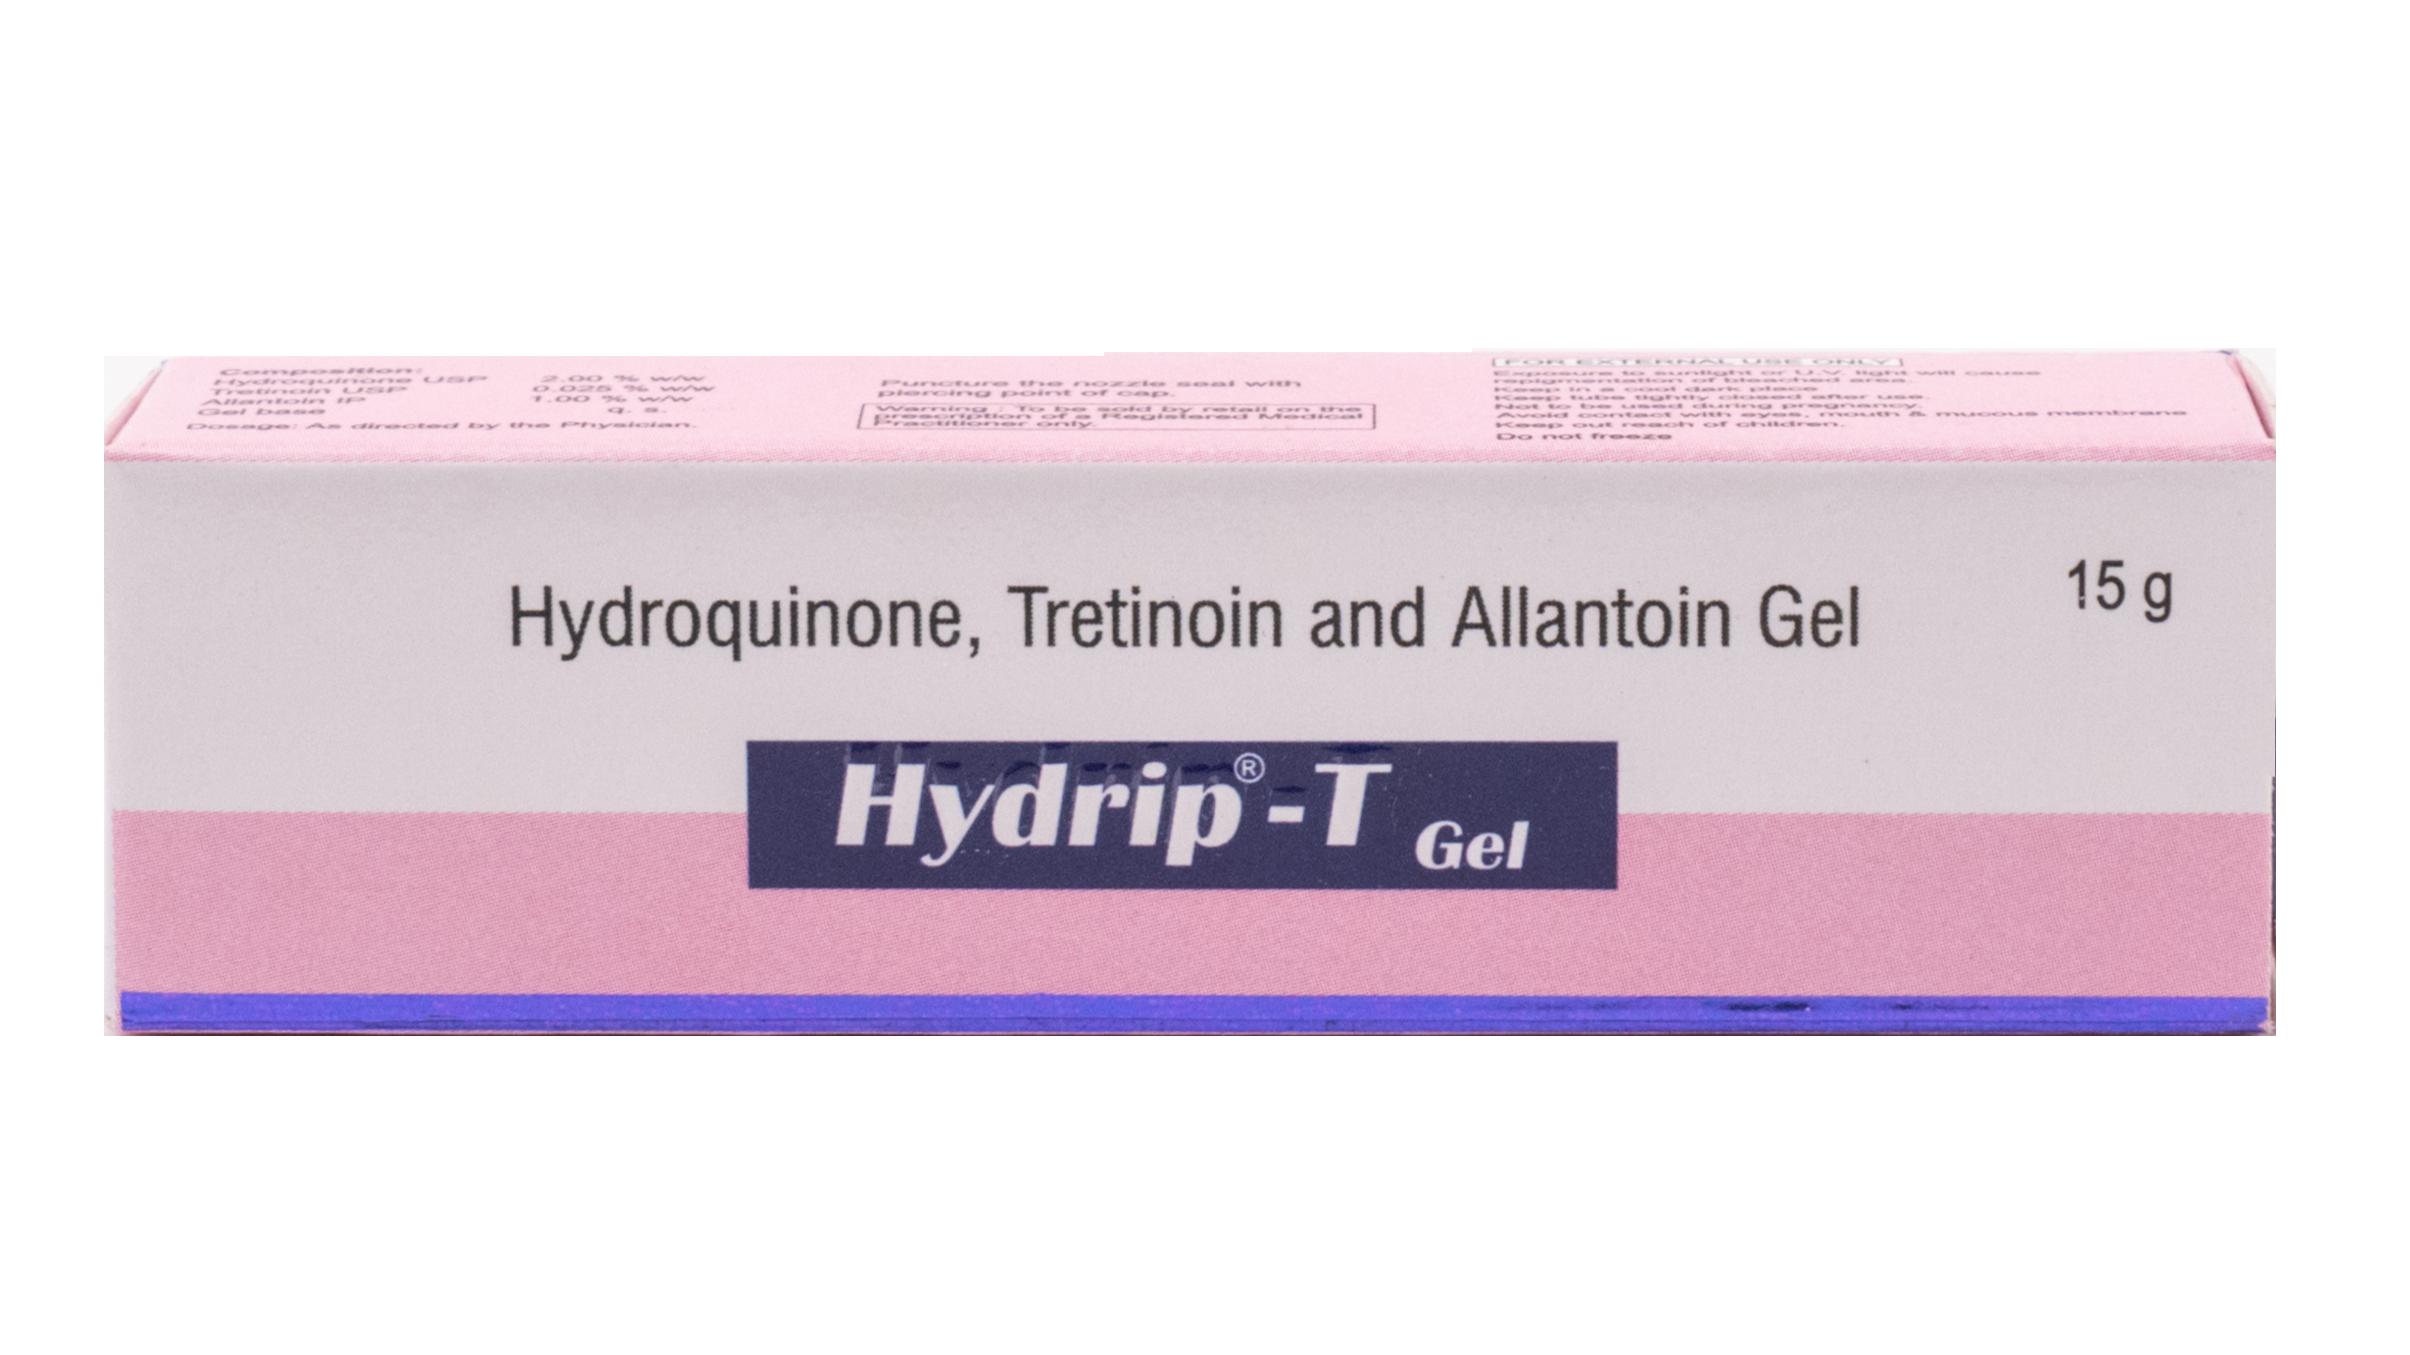 Hydroquinone , Tretinoin, Allantoin Gel